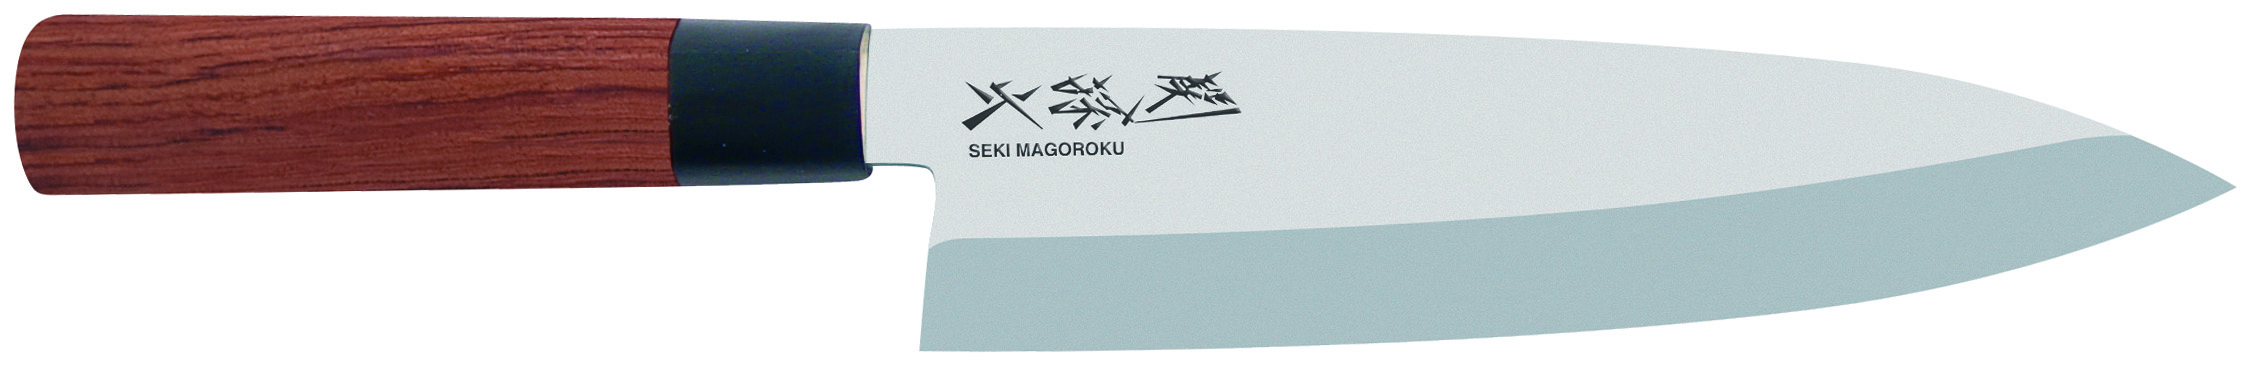 KAI Seki Magoroku